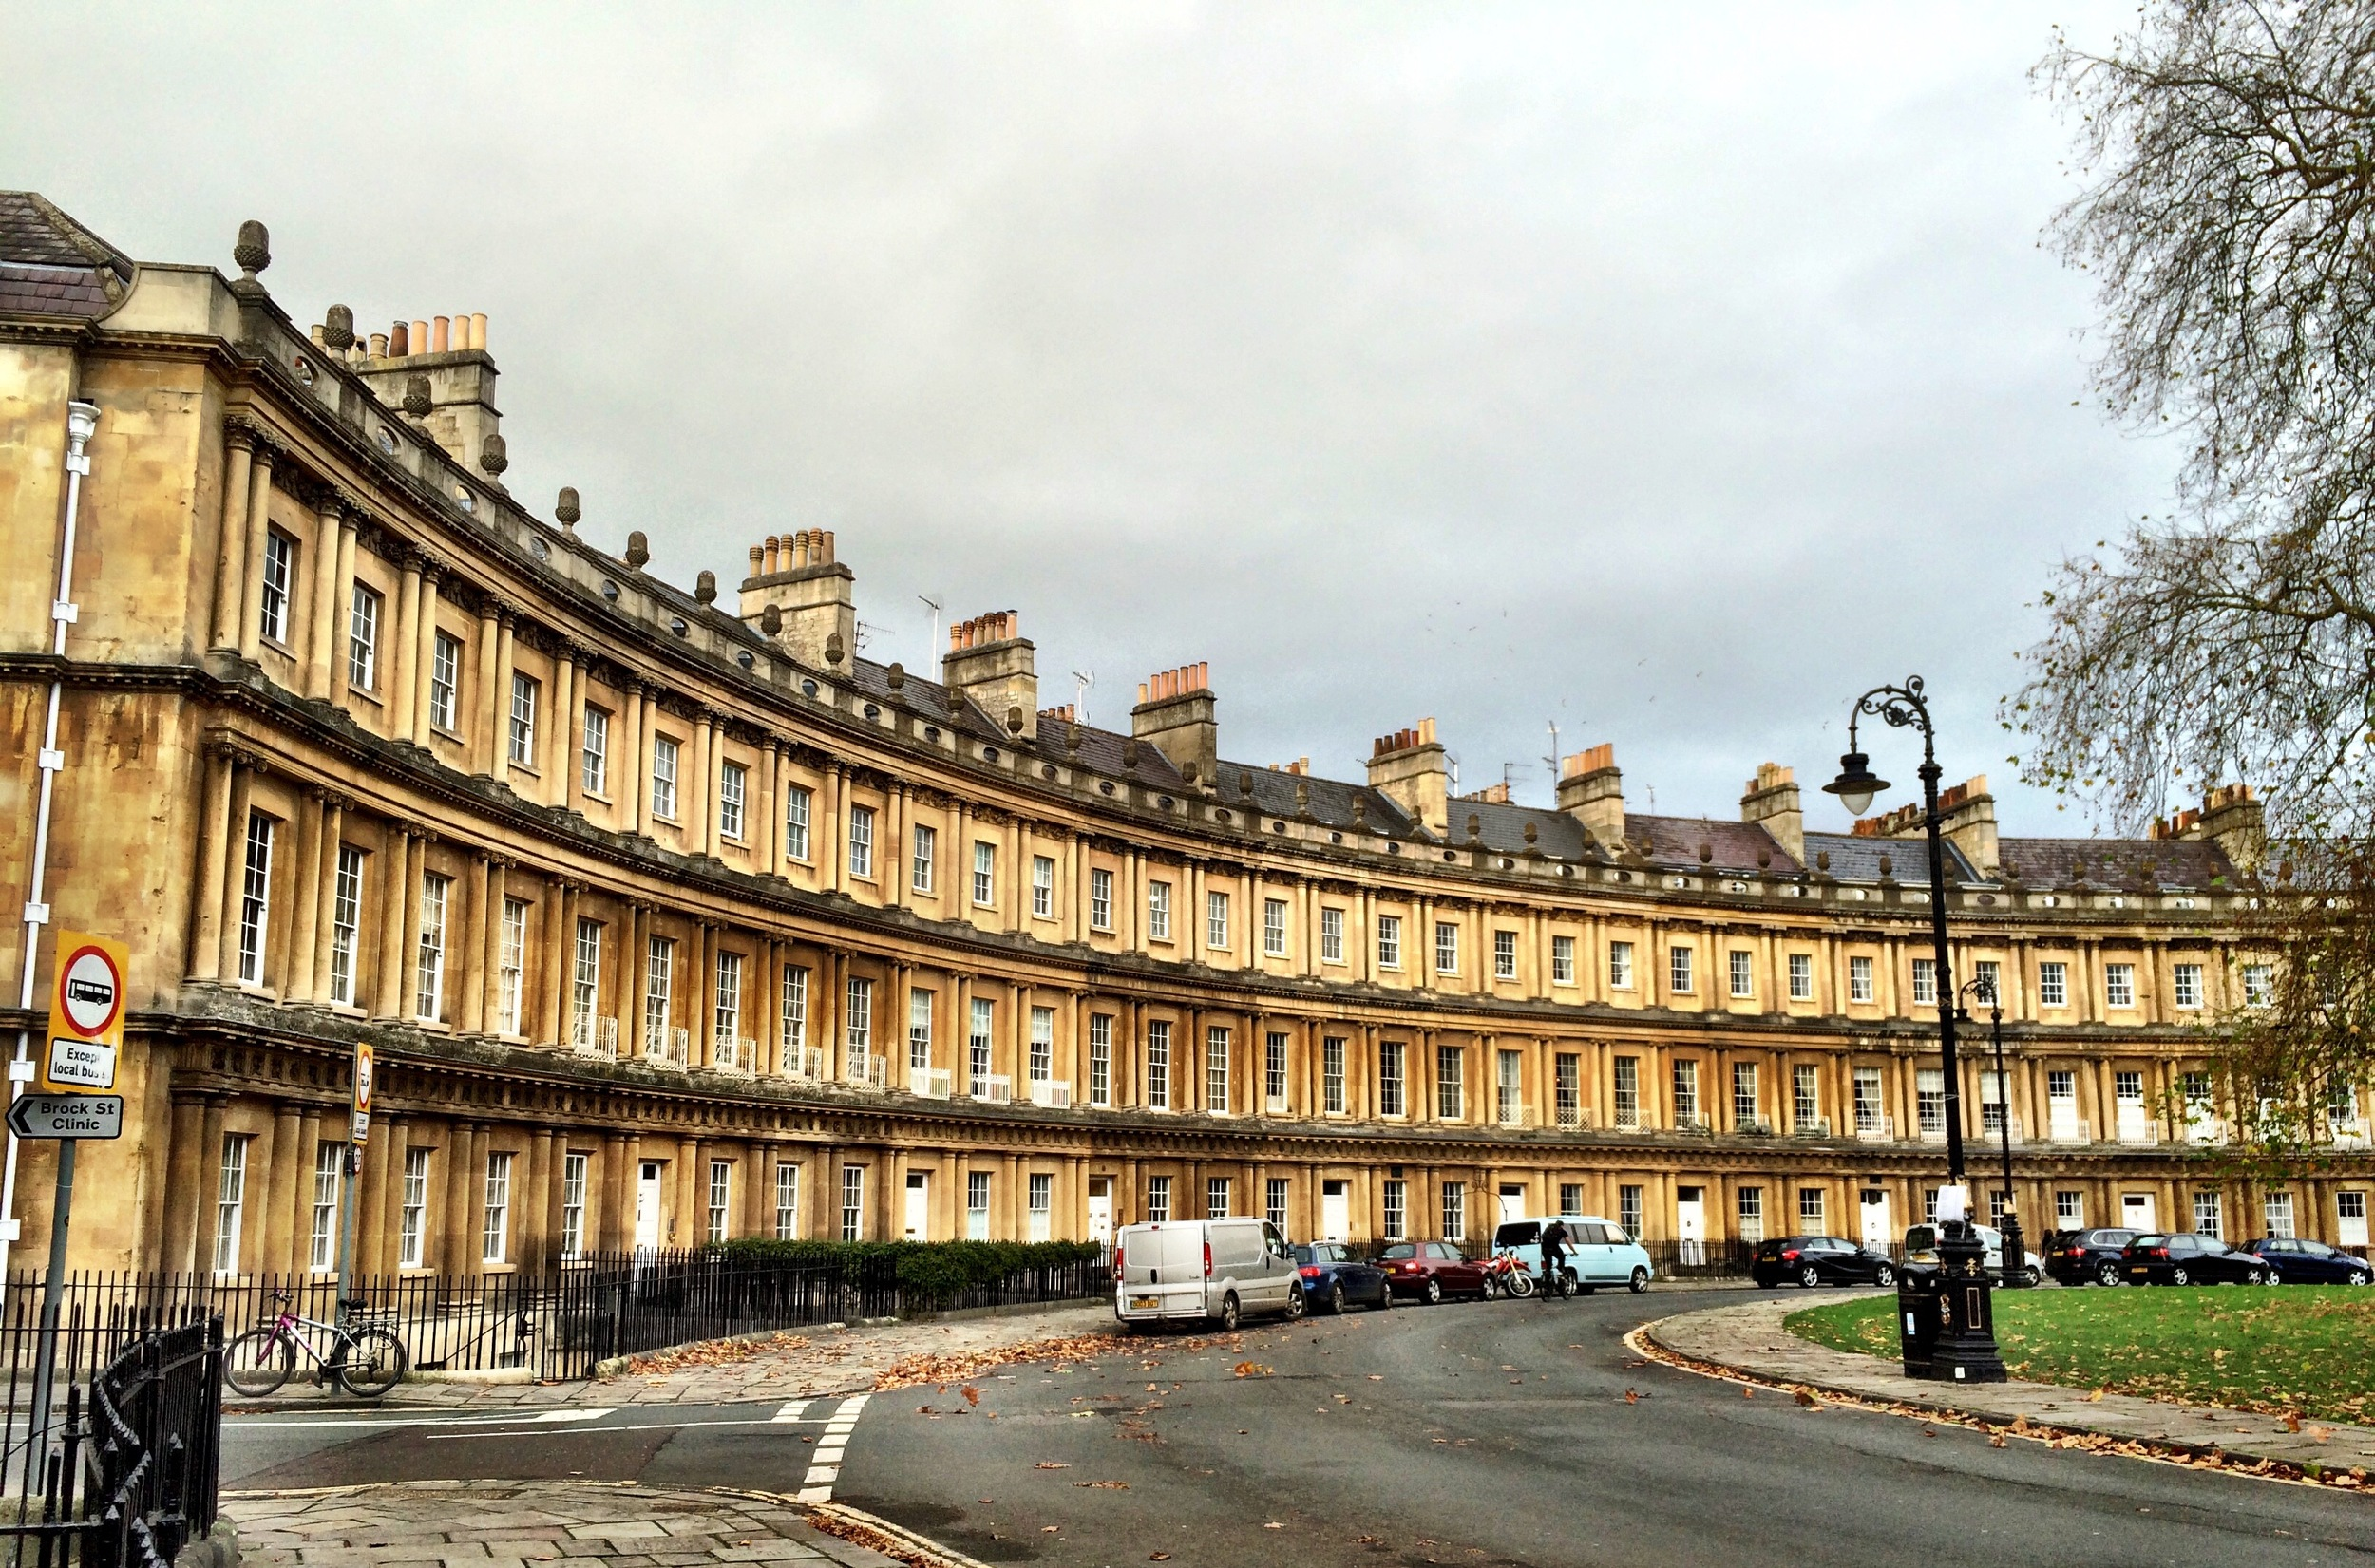 Bath, United Kingdom: November 2015